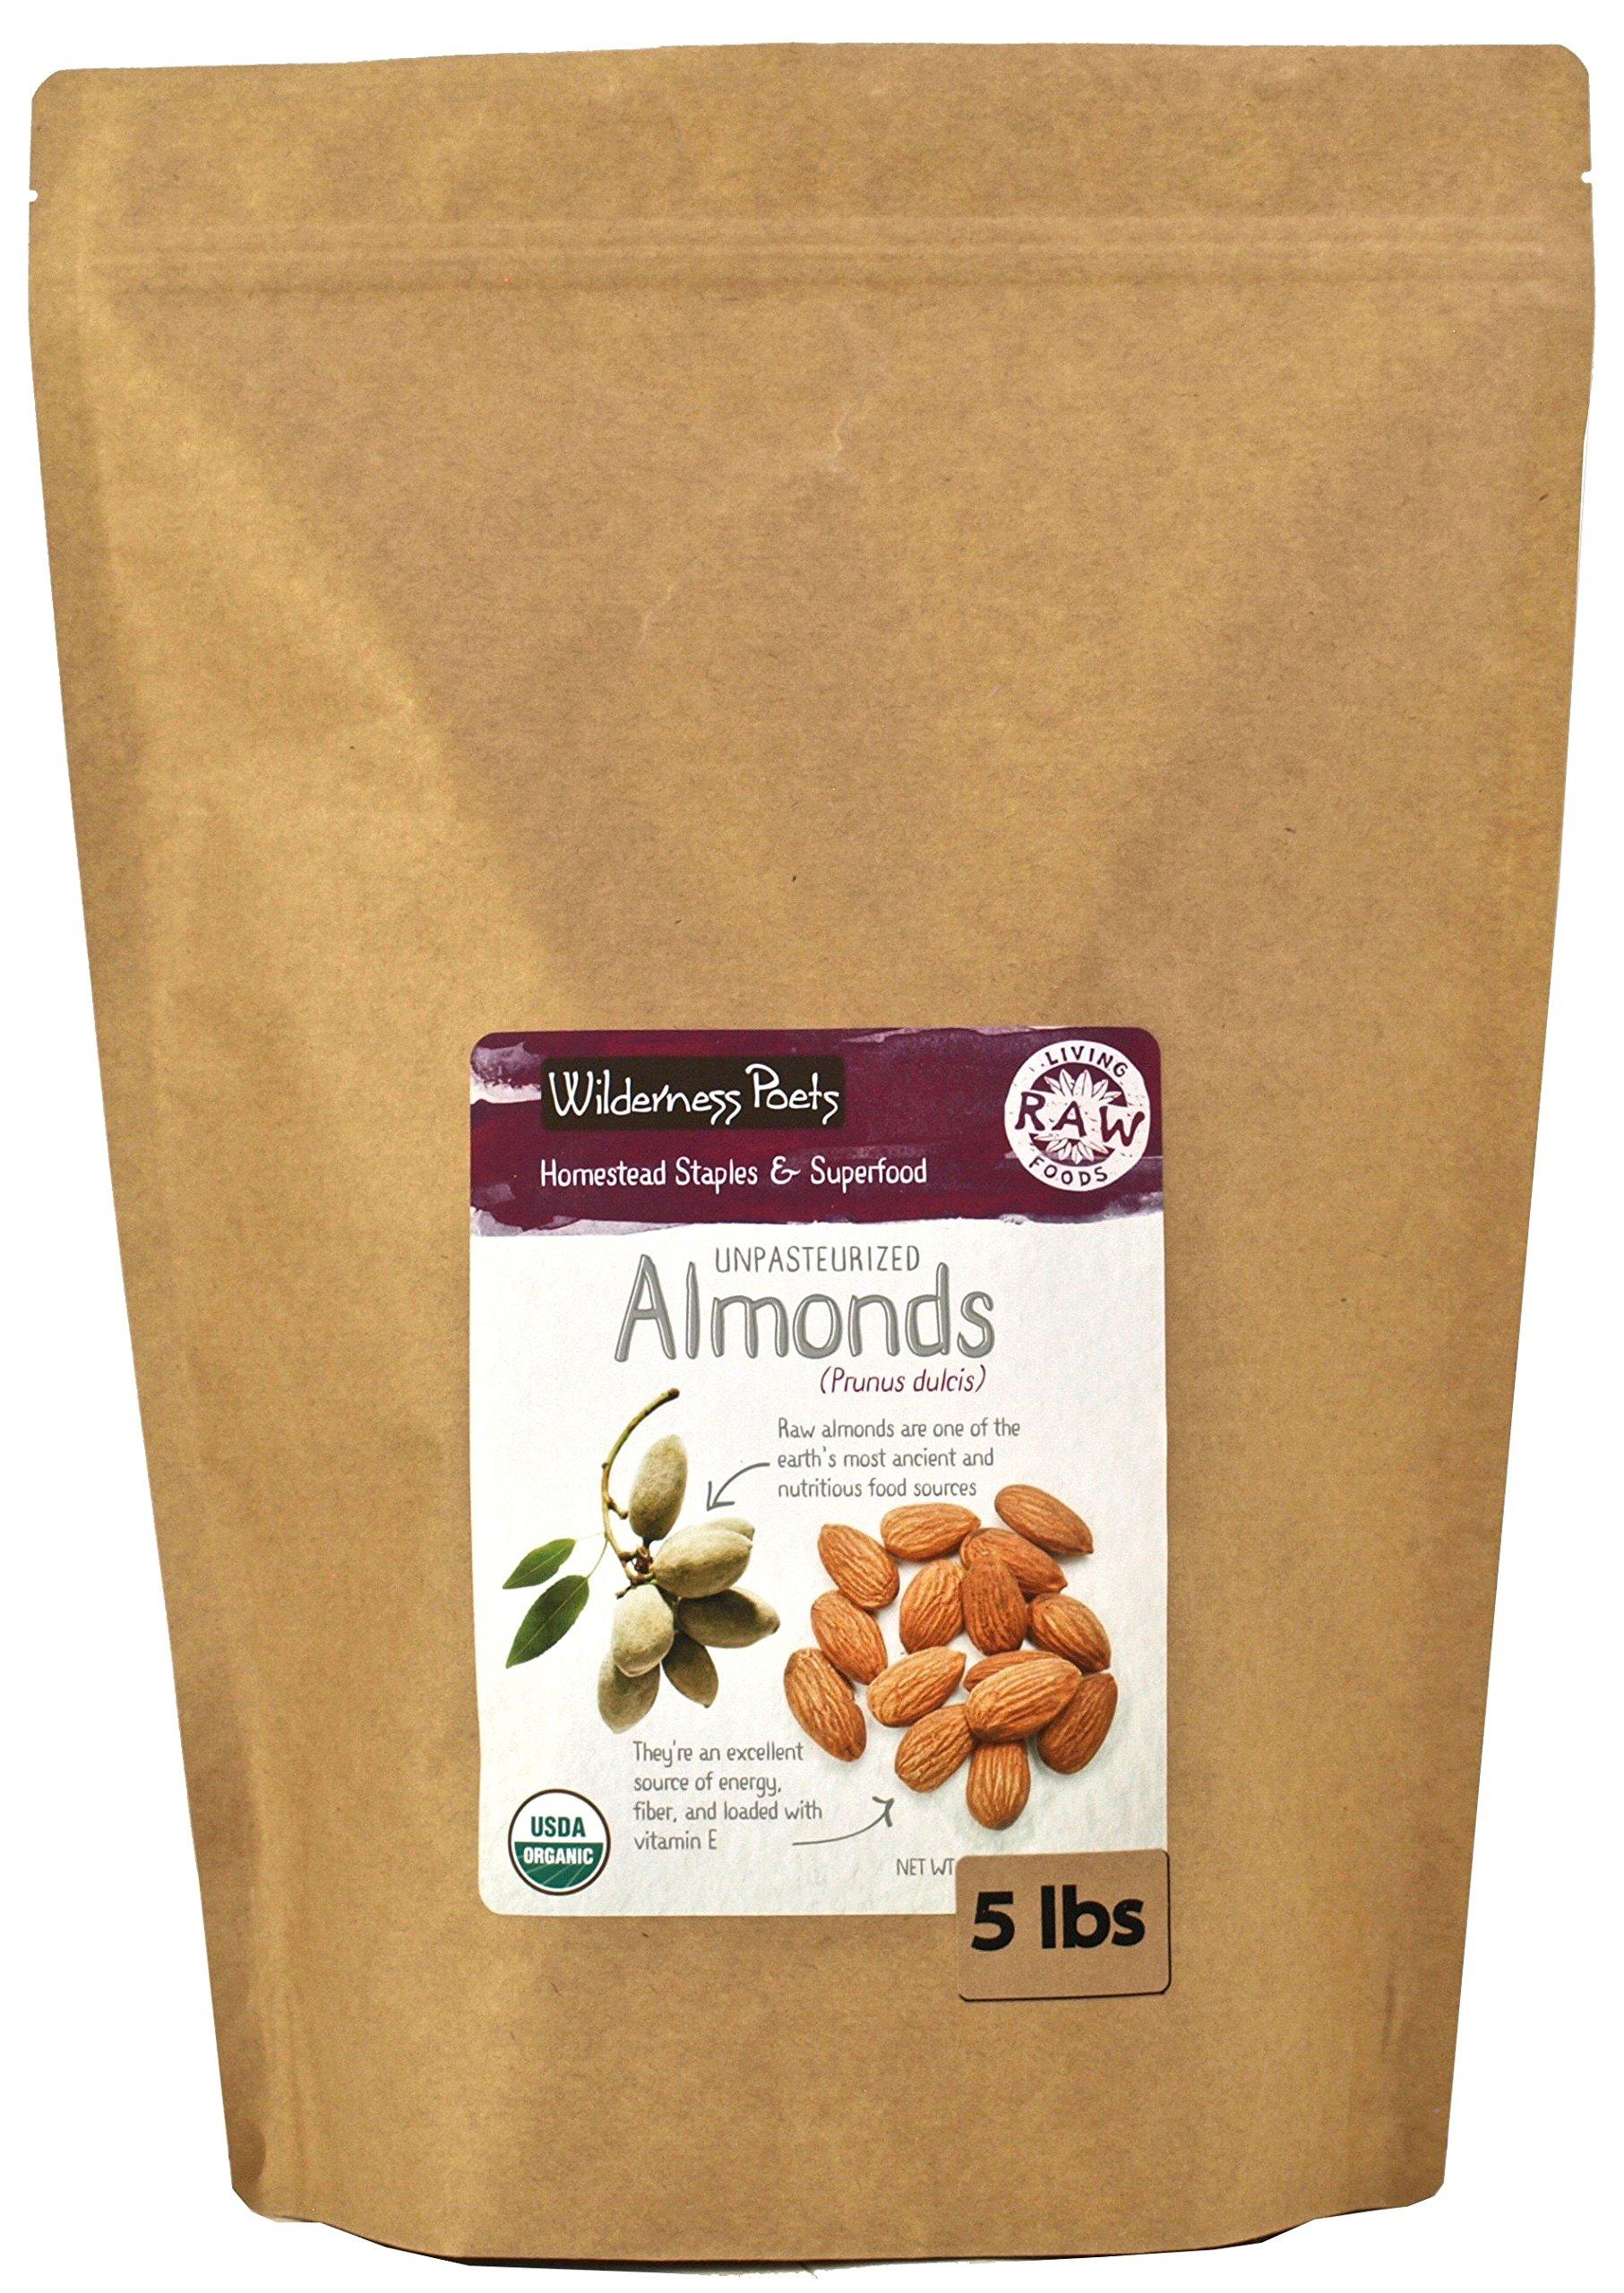 Wilderness Poets Unpasteurized Almonds - Raw Organic Almonds - Bulk Almonds, 5 lb (80 oz)